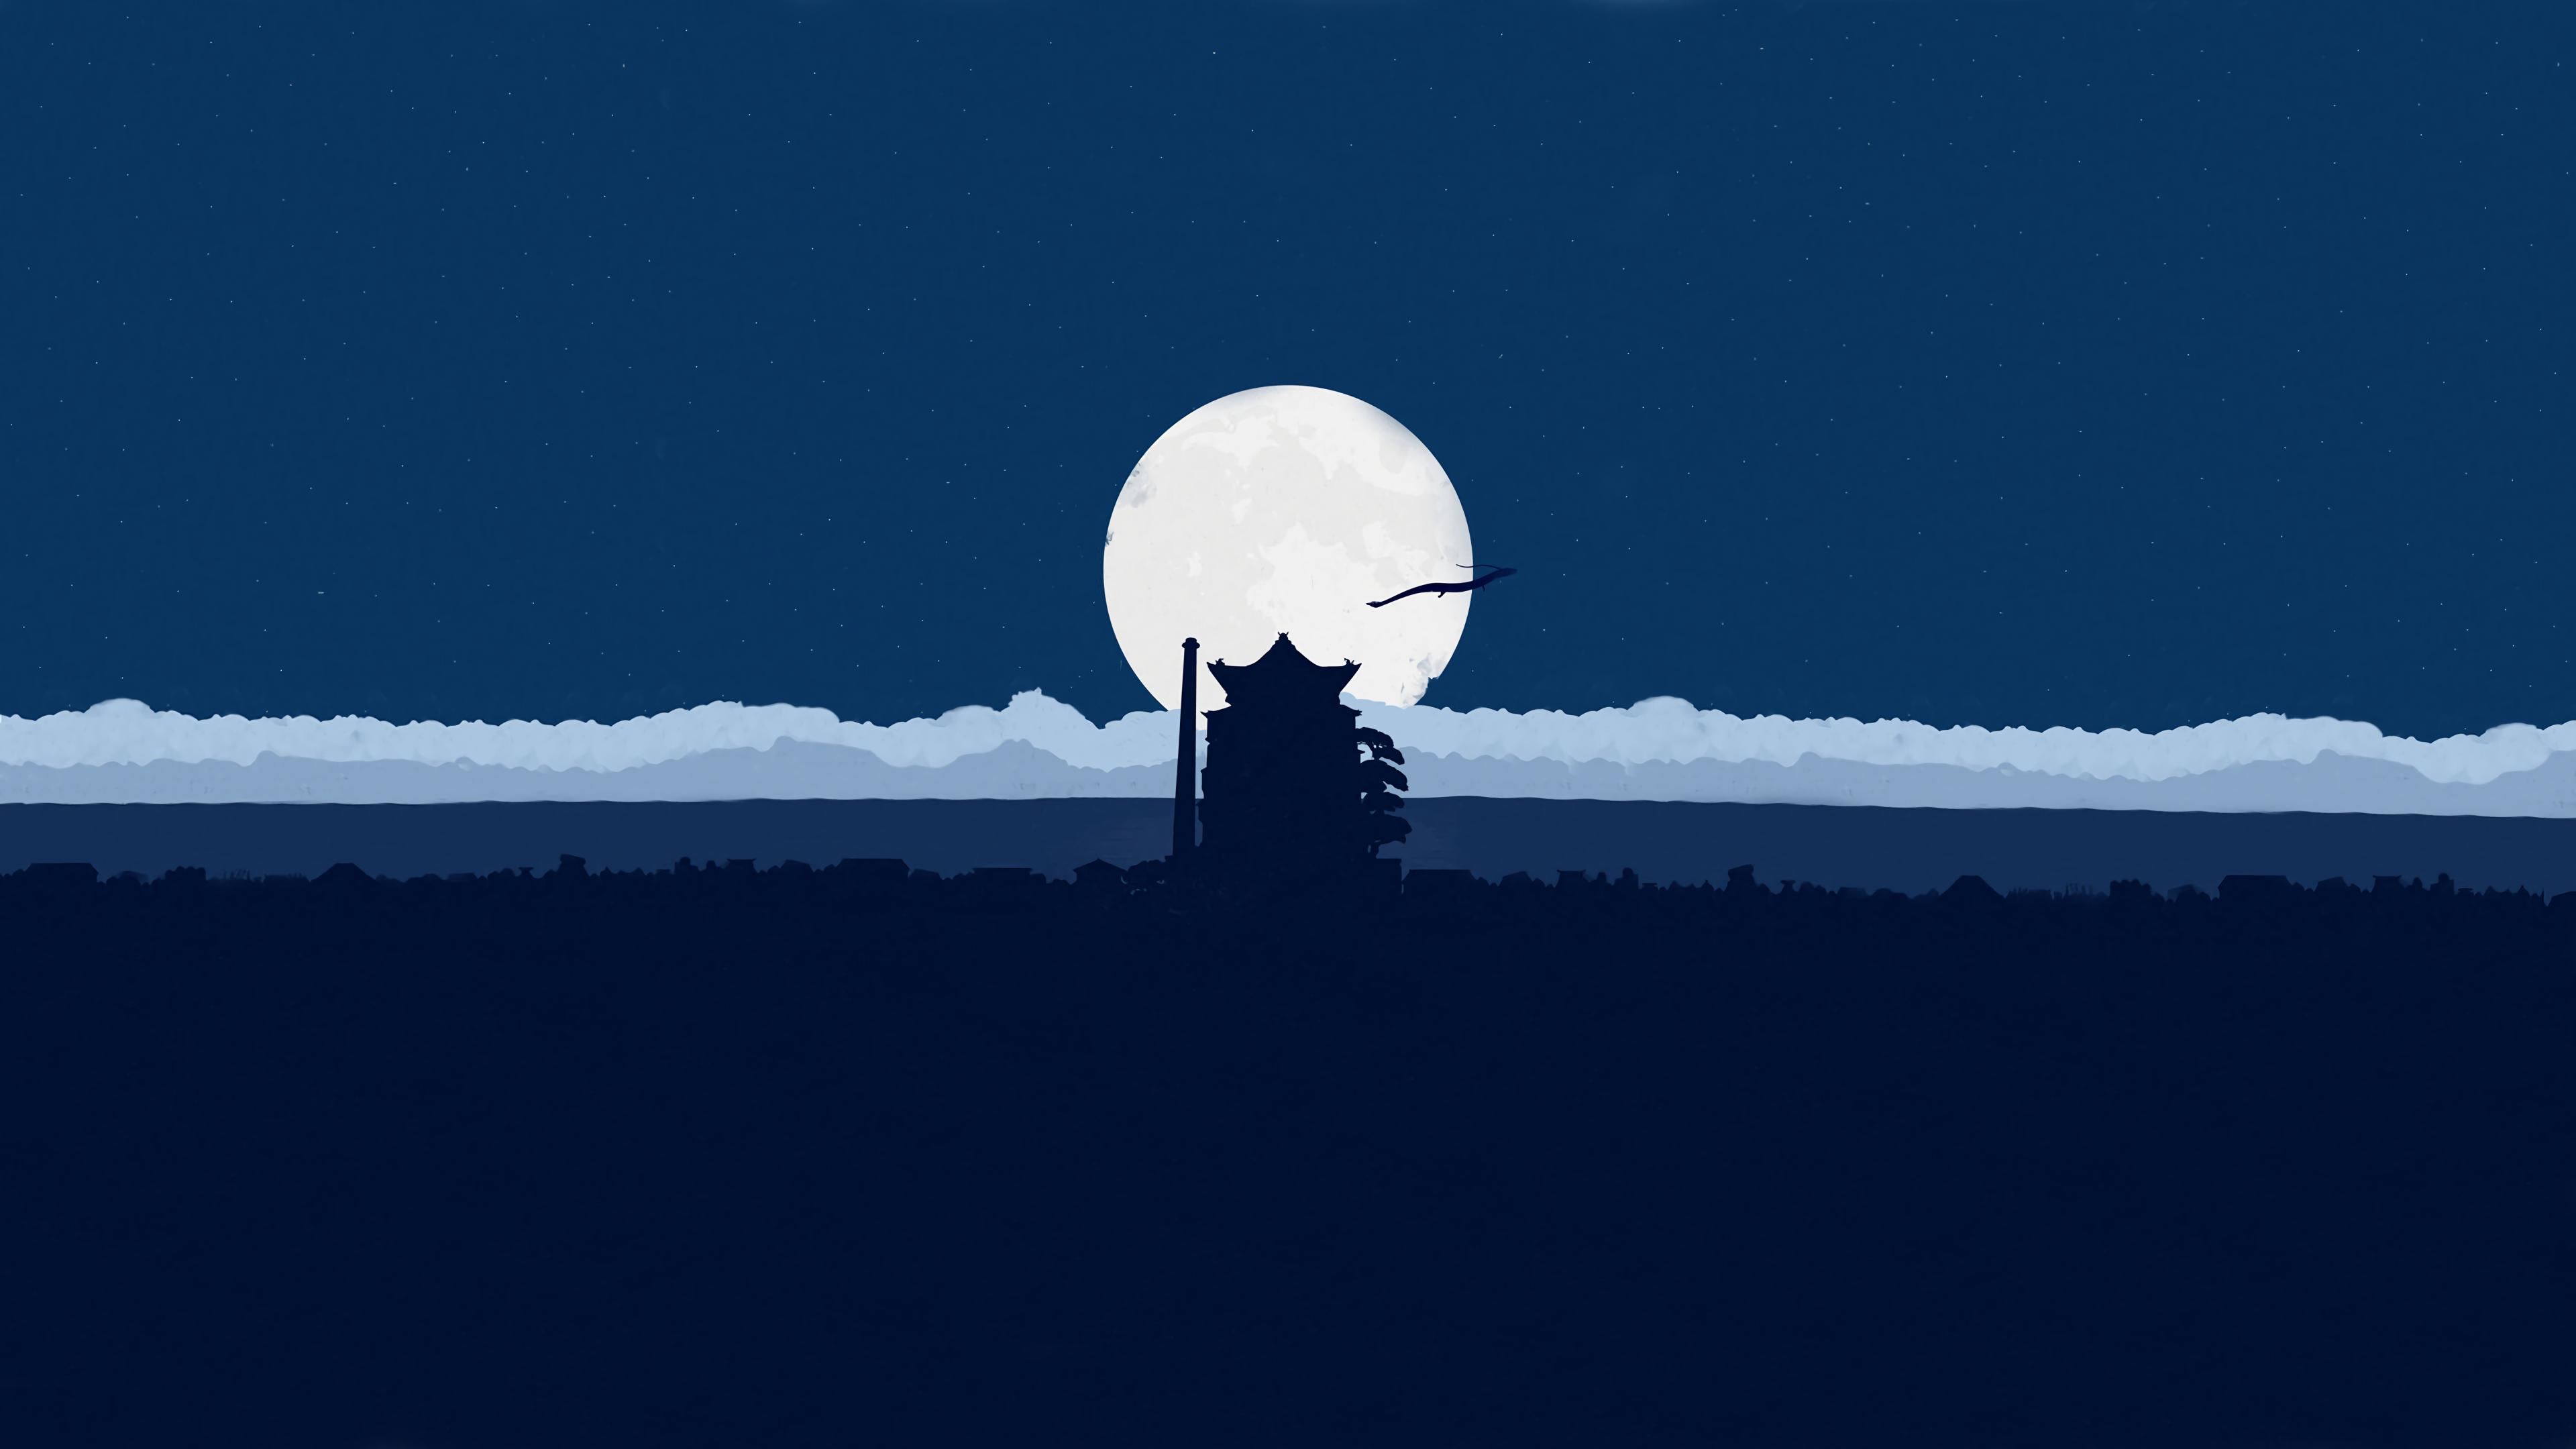 Anime 3840x2160 minimalism blue clear sky Spirited Away sen to chihiro shadow clouds anime fan art moonlight simple